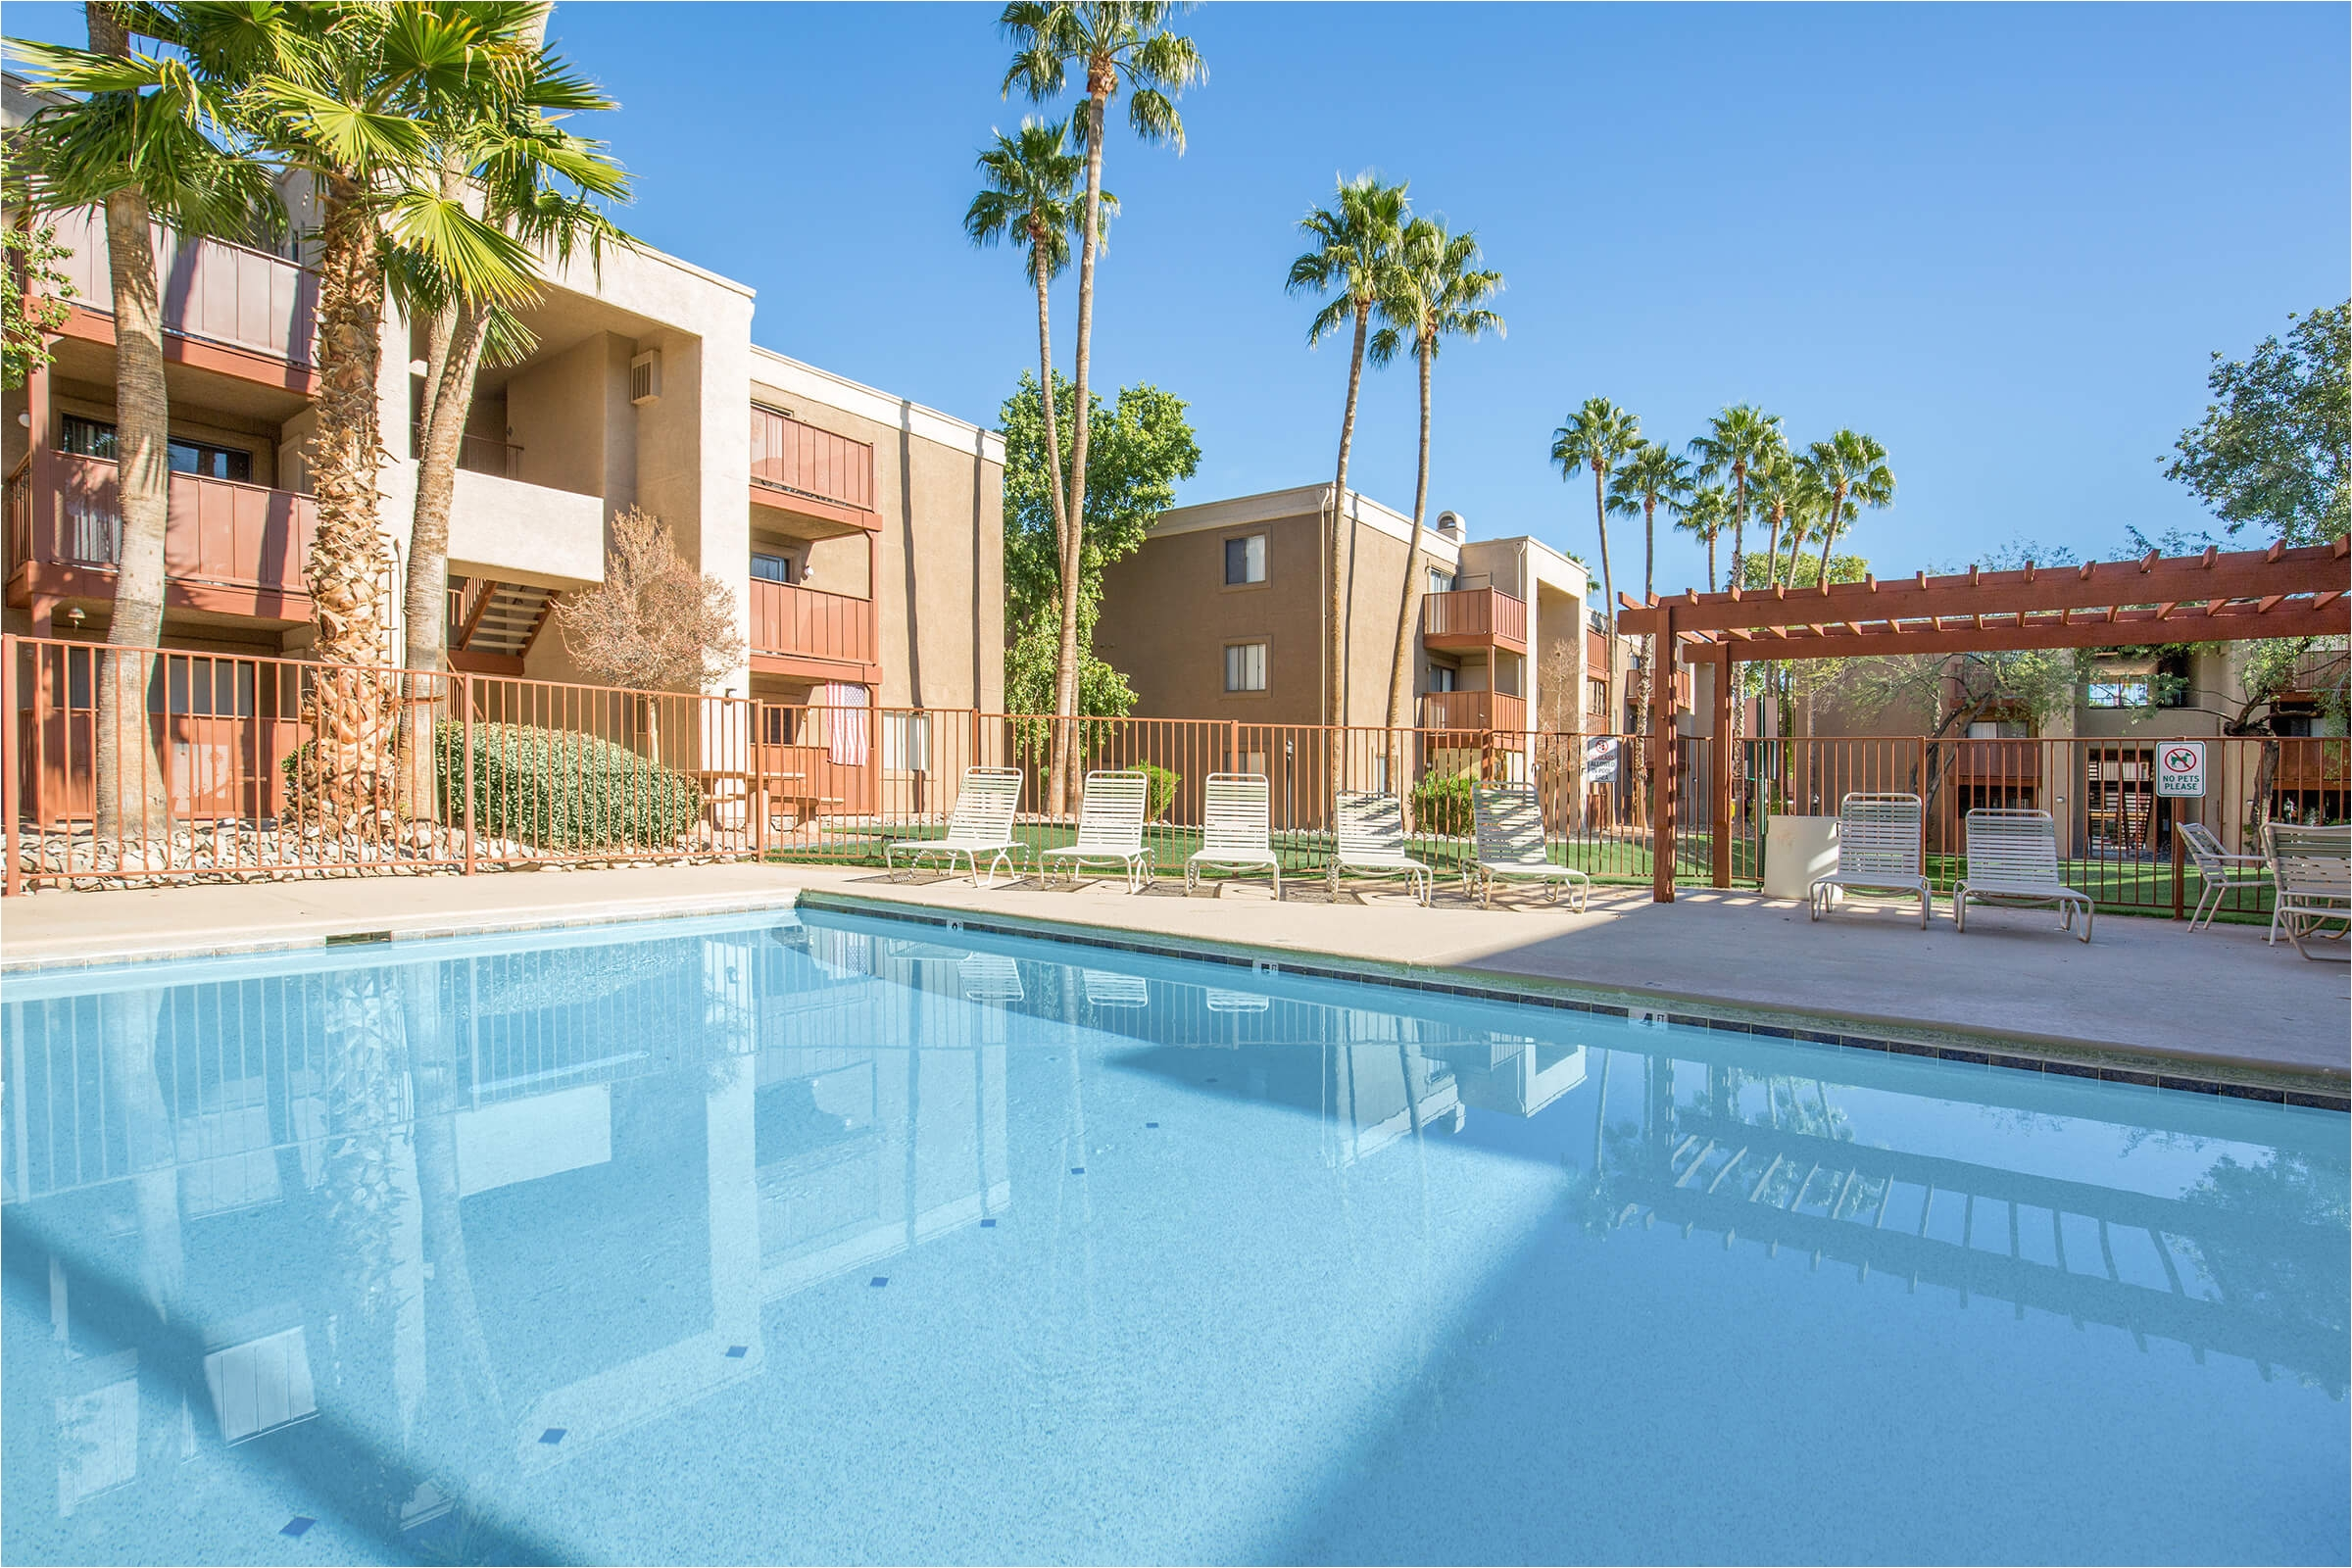 desert shadows apartments